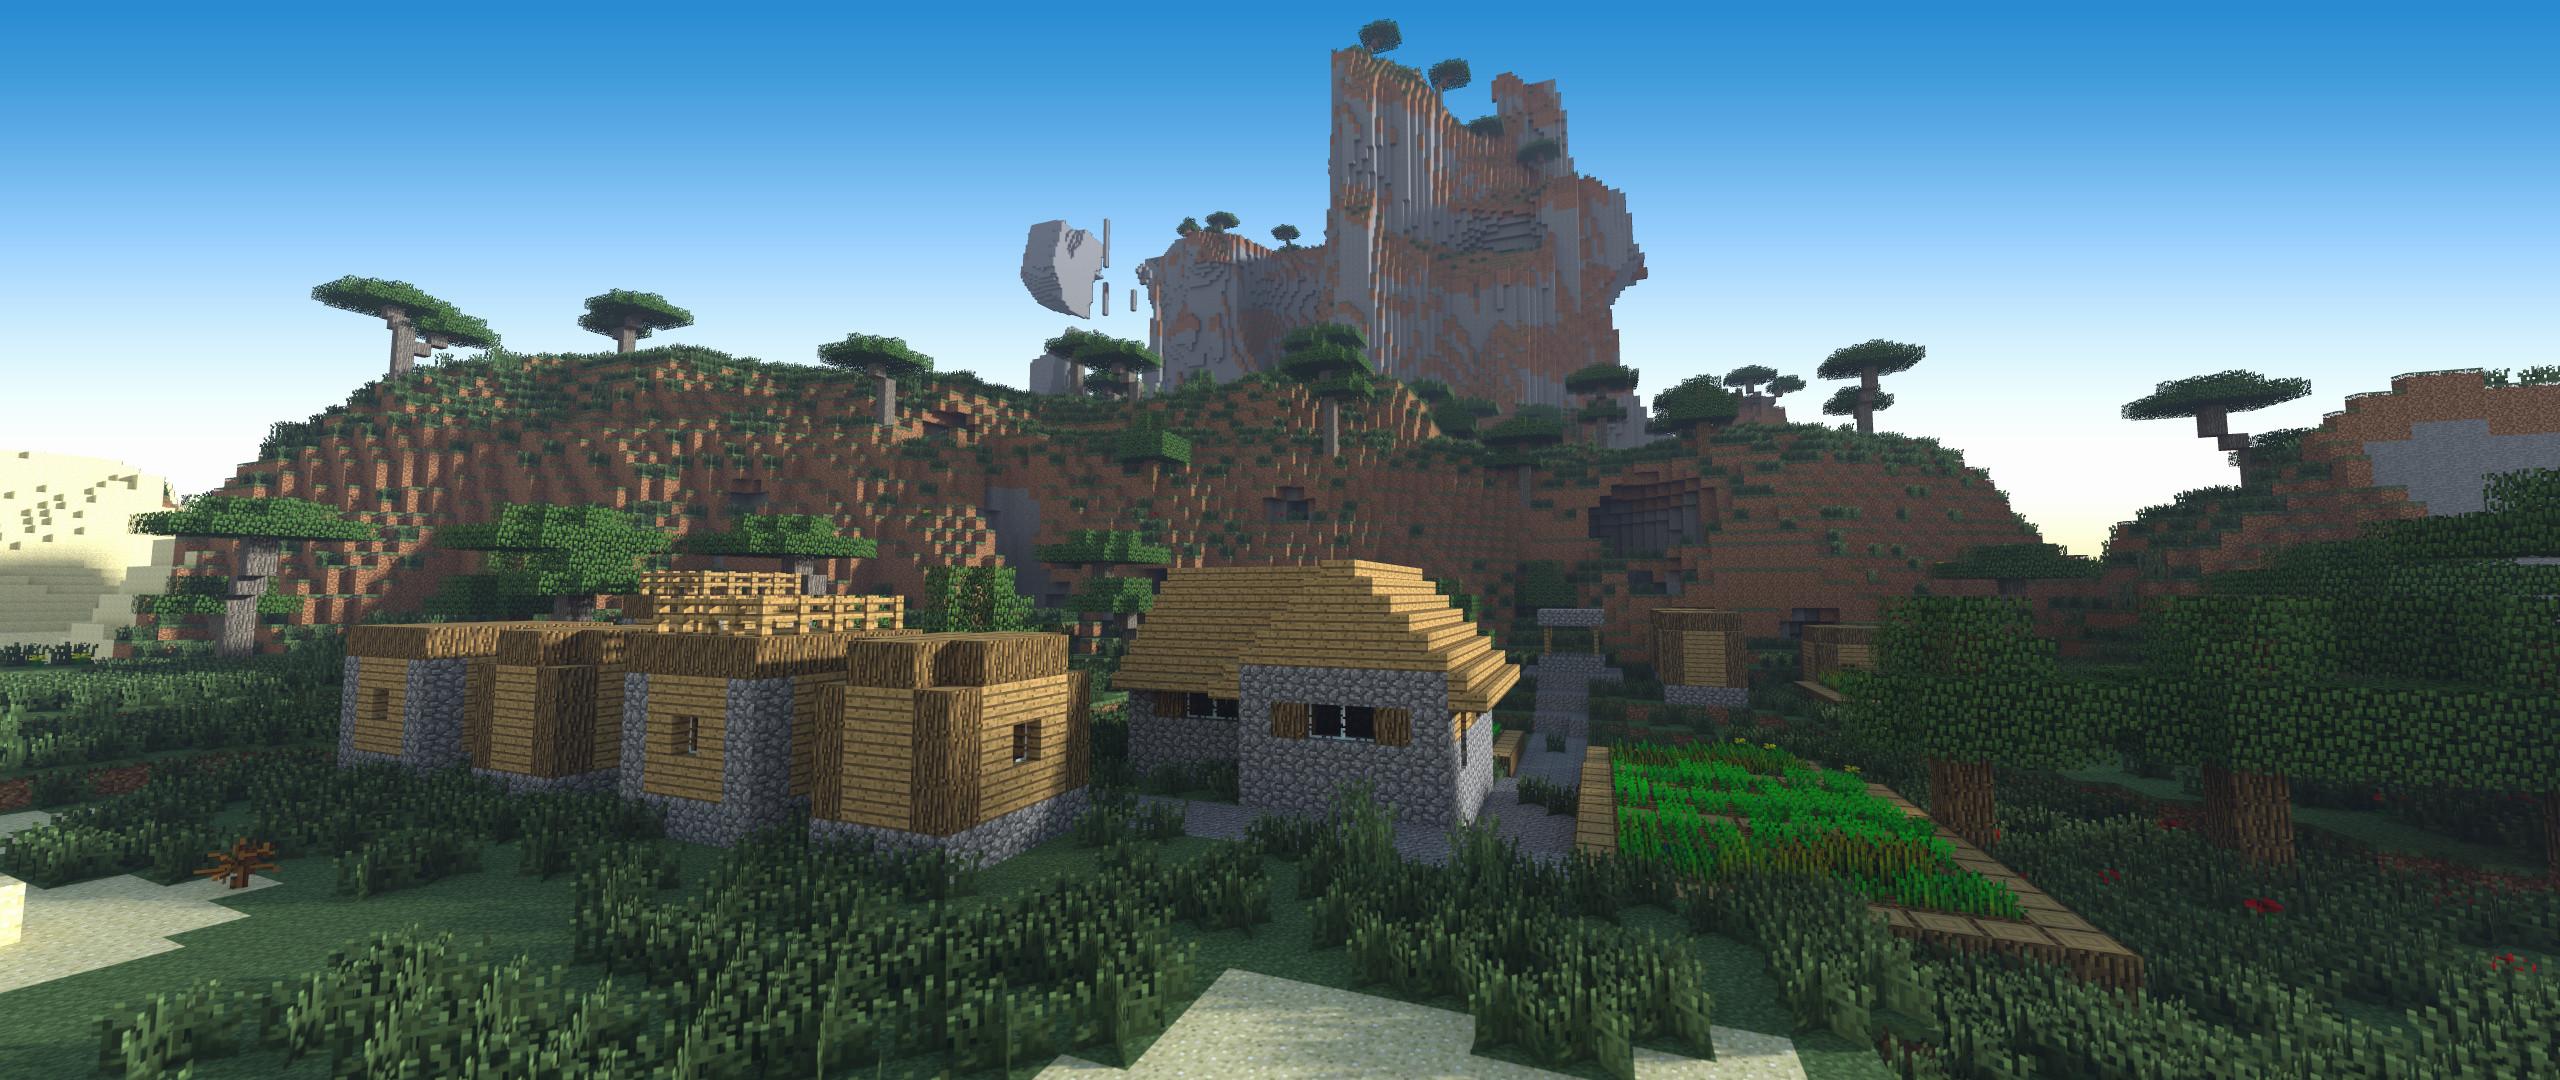 Res: 2560x1080, Mcpe Wallpaper New Minecraft Wallpaper Landscape Background